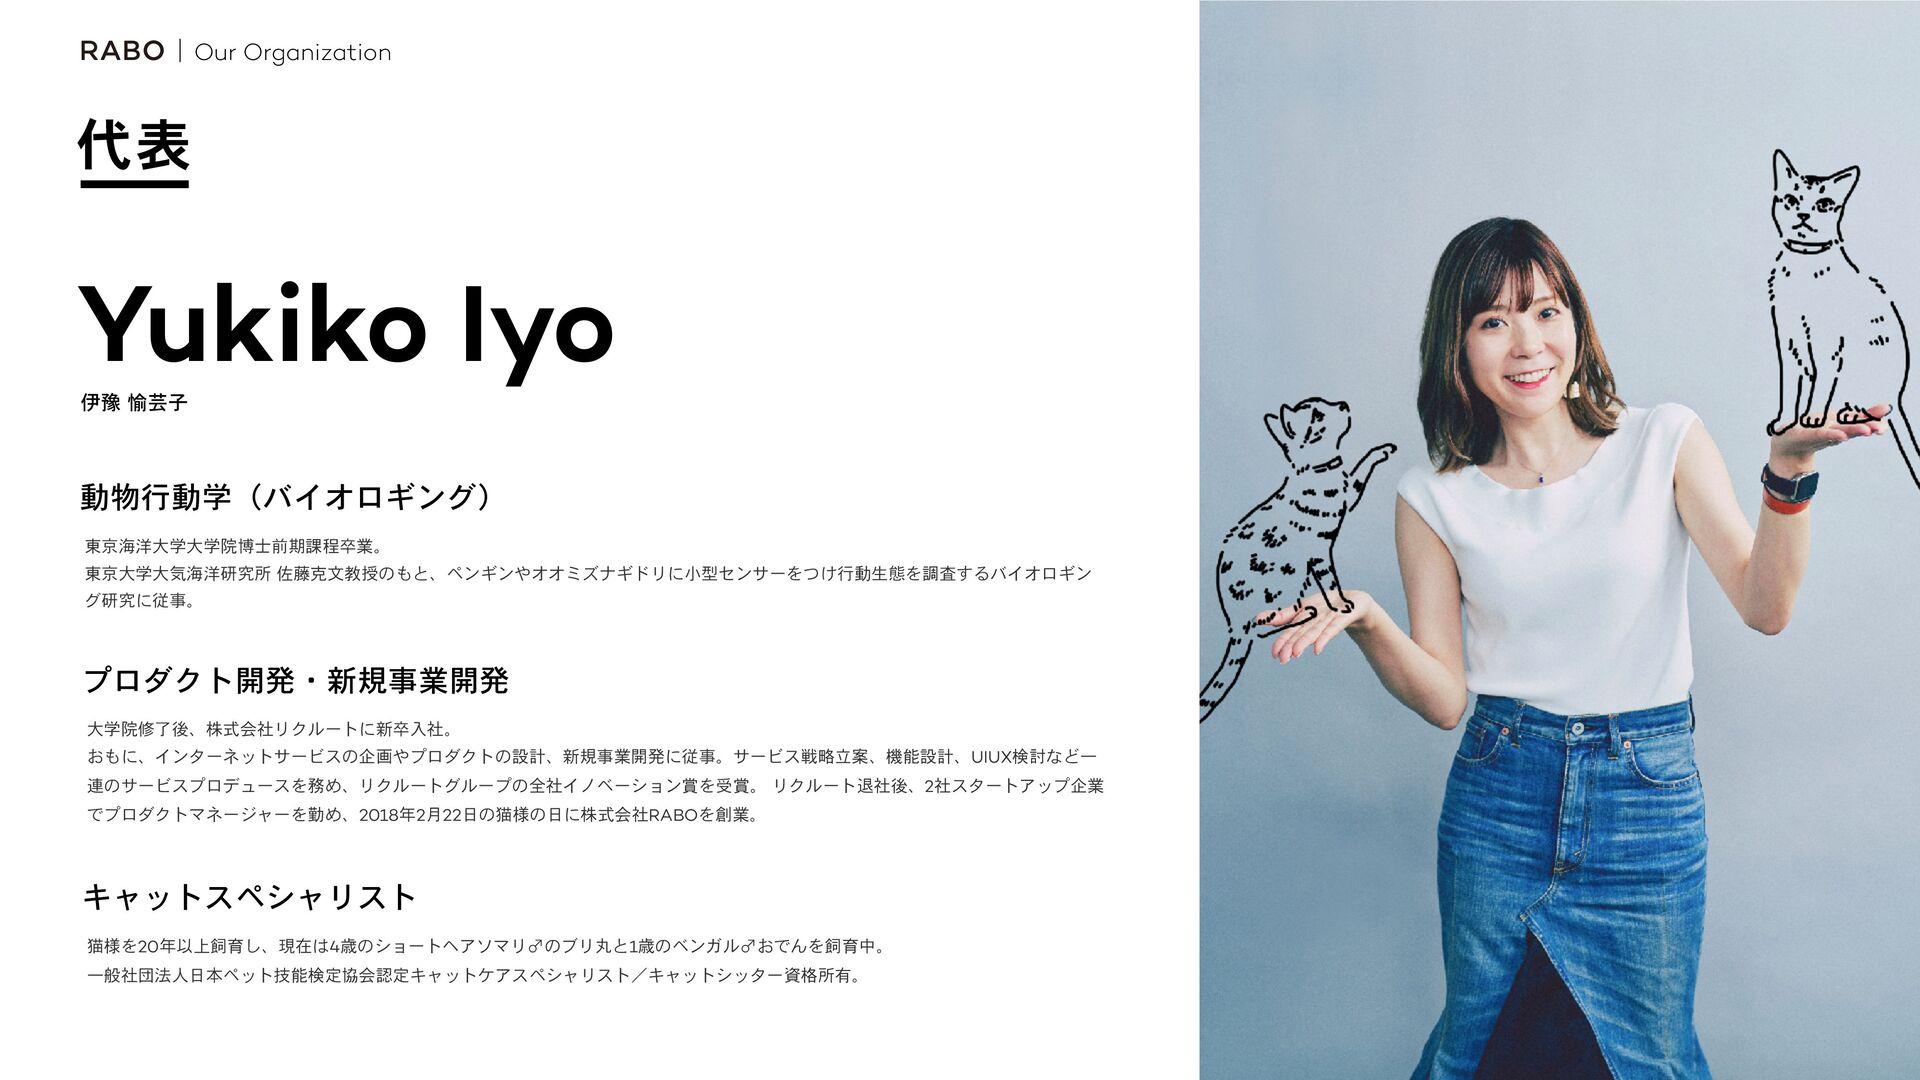 31 ද Yukiko Iyo ҏဇ༇ܳࢠ ౦ژւ༸େֶେֶӃതલظ՝ఔଔۀɻ ౦ژ...